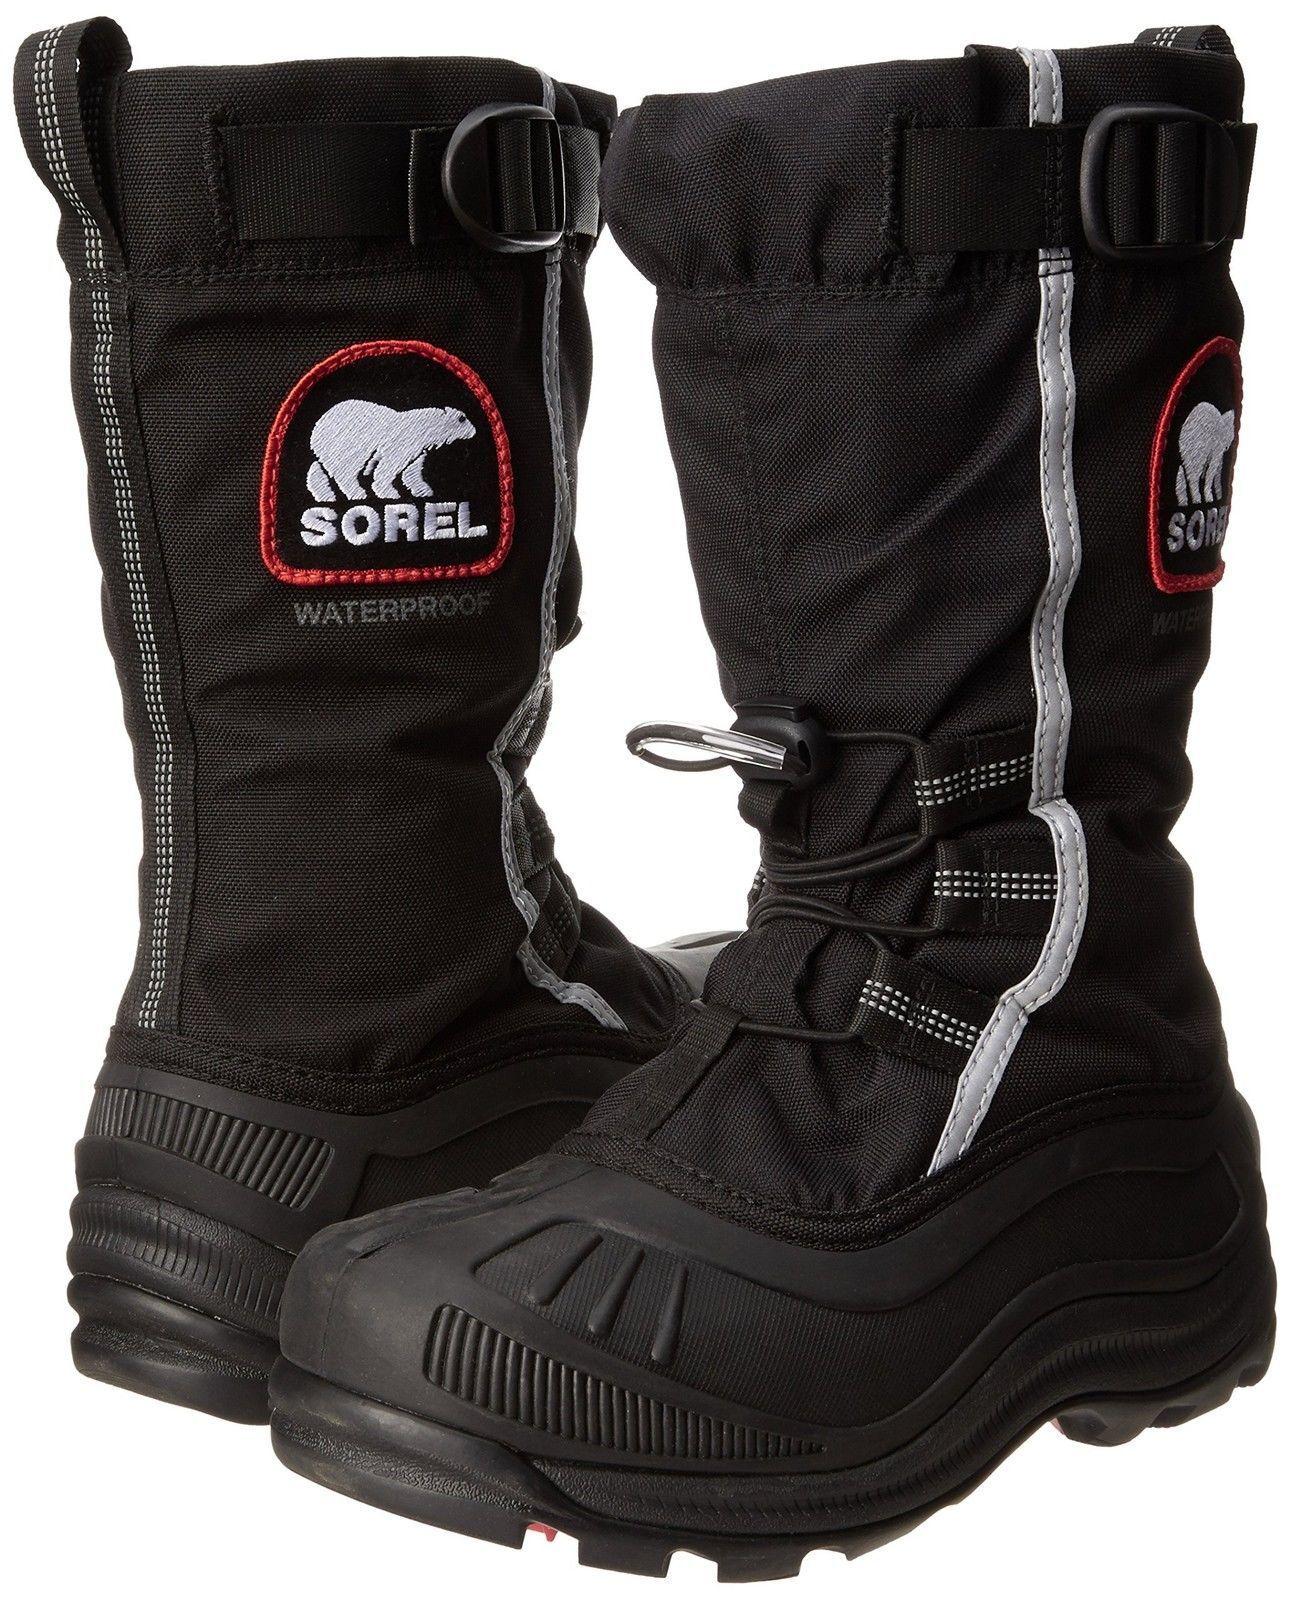 New in Box Sorel Women's Alpha Pac XT Boot Black/Red Quartz Size 7 SNOW BOOTS